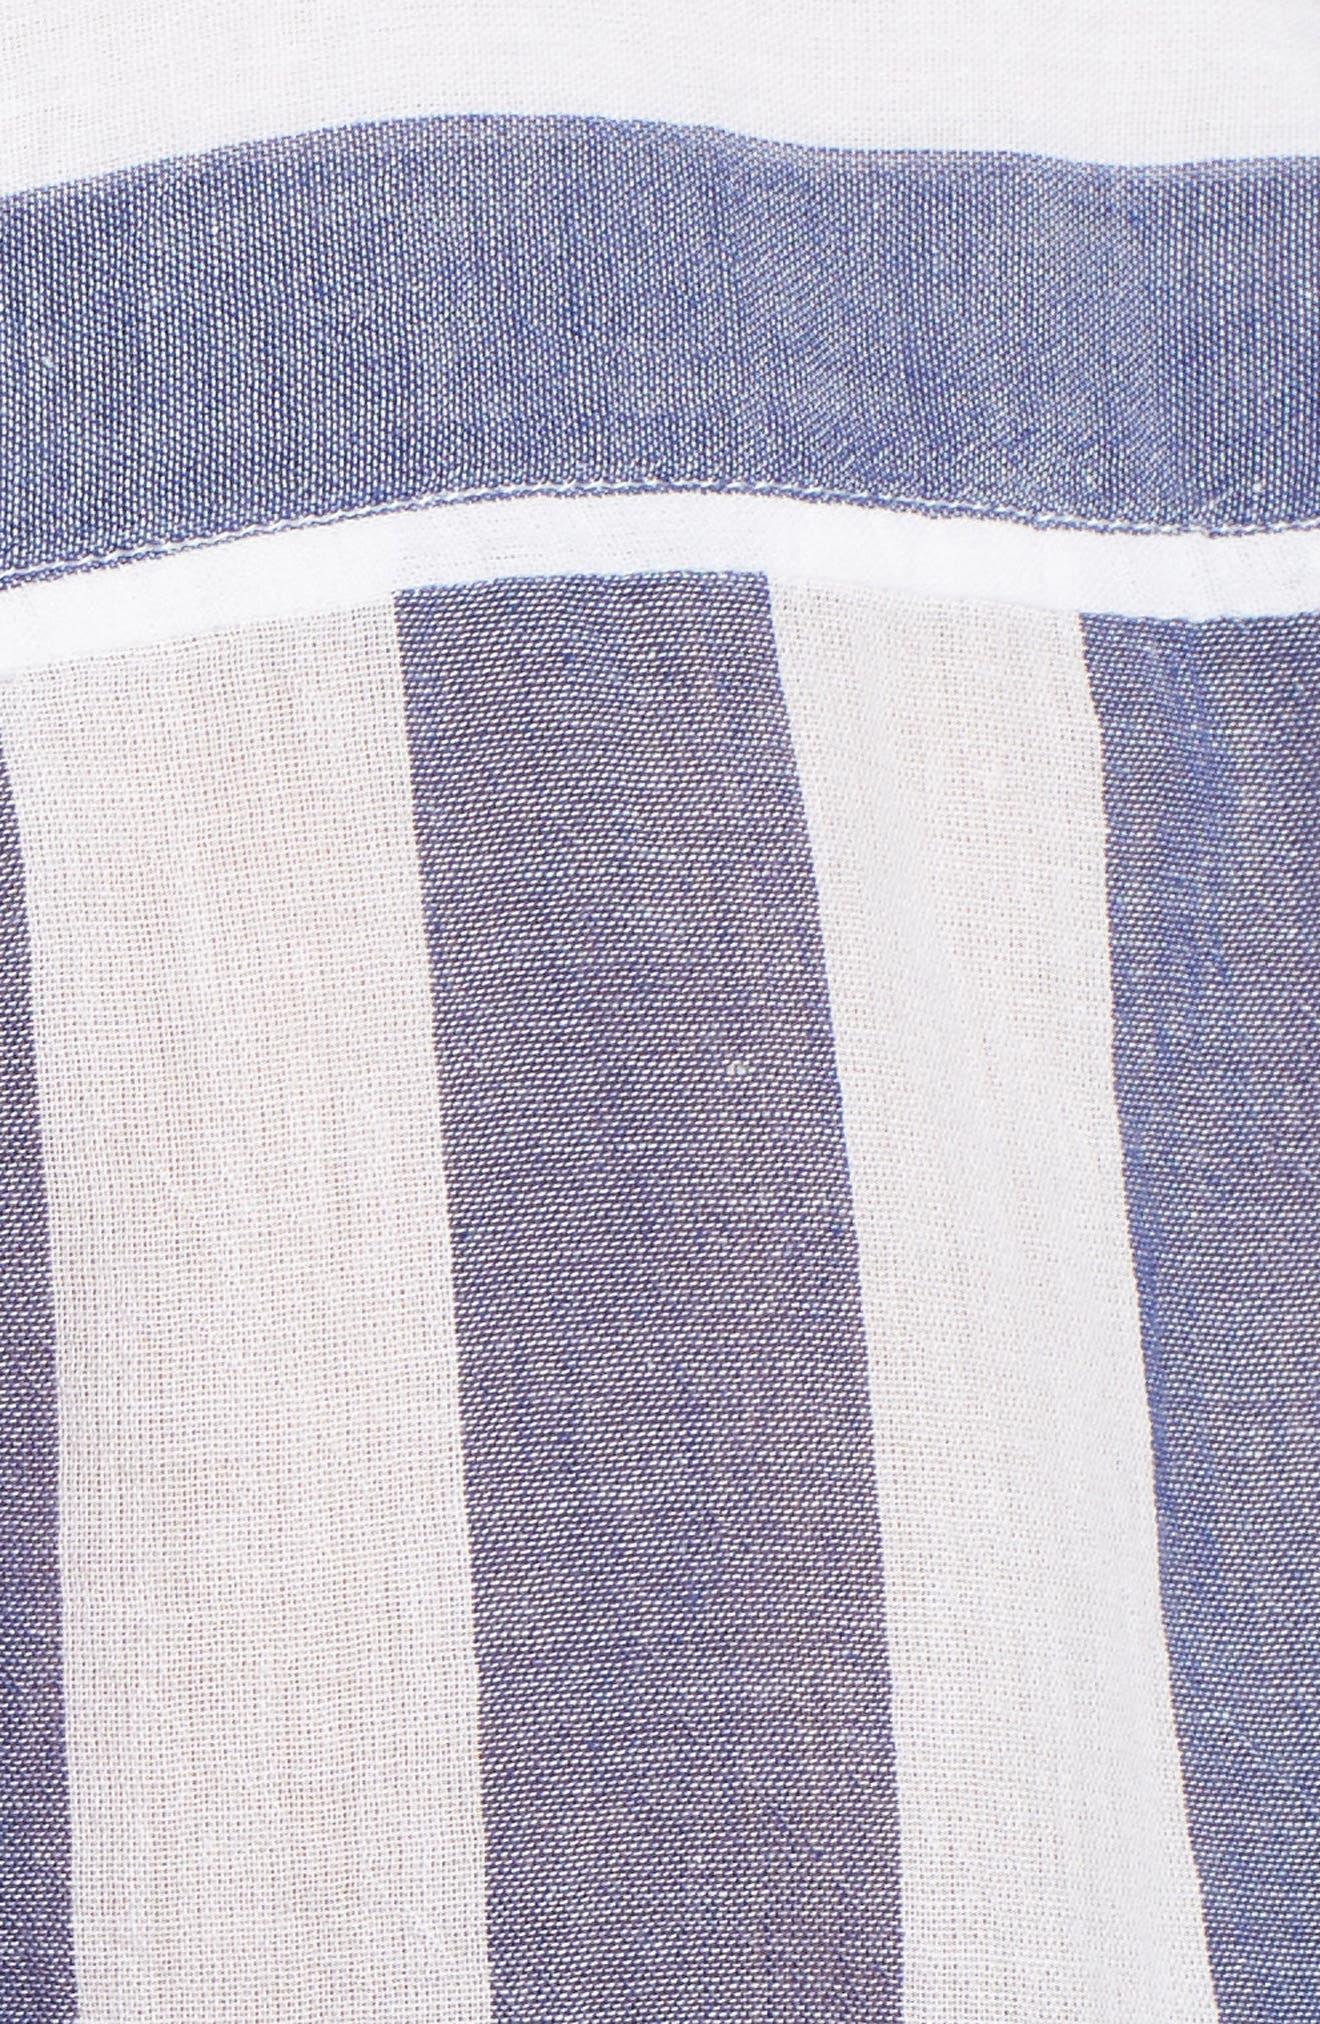 Stripe Tie Back Crinkle Cotton Top,                             Alternate thumbnail 6, color,                             460